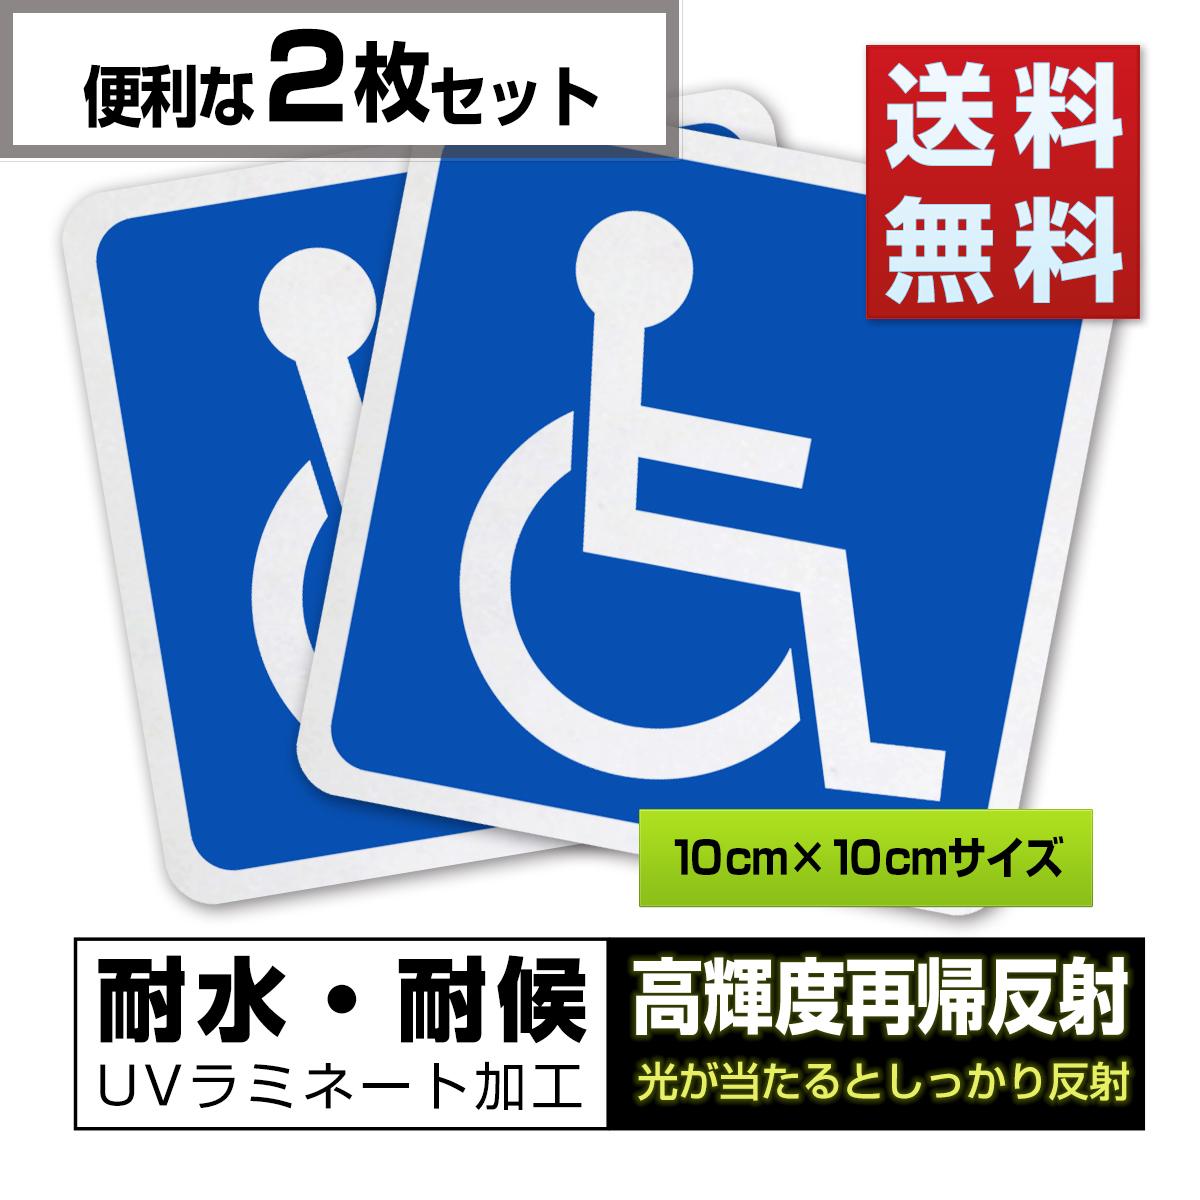 NEW OPENにつき全品送料無料 身障者用設備 本物 国際シンボルマーク ステッカー 高耐候 強粘着 屋外可能 SAFETY 2枚 障害者用 日本全国 送料無料 再帰反射タイプ 100X100mm 車椅子 MANIA製